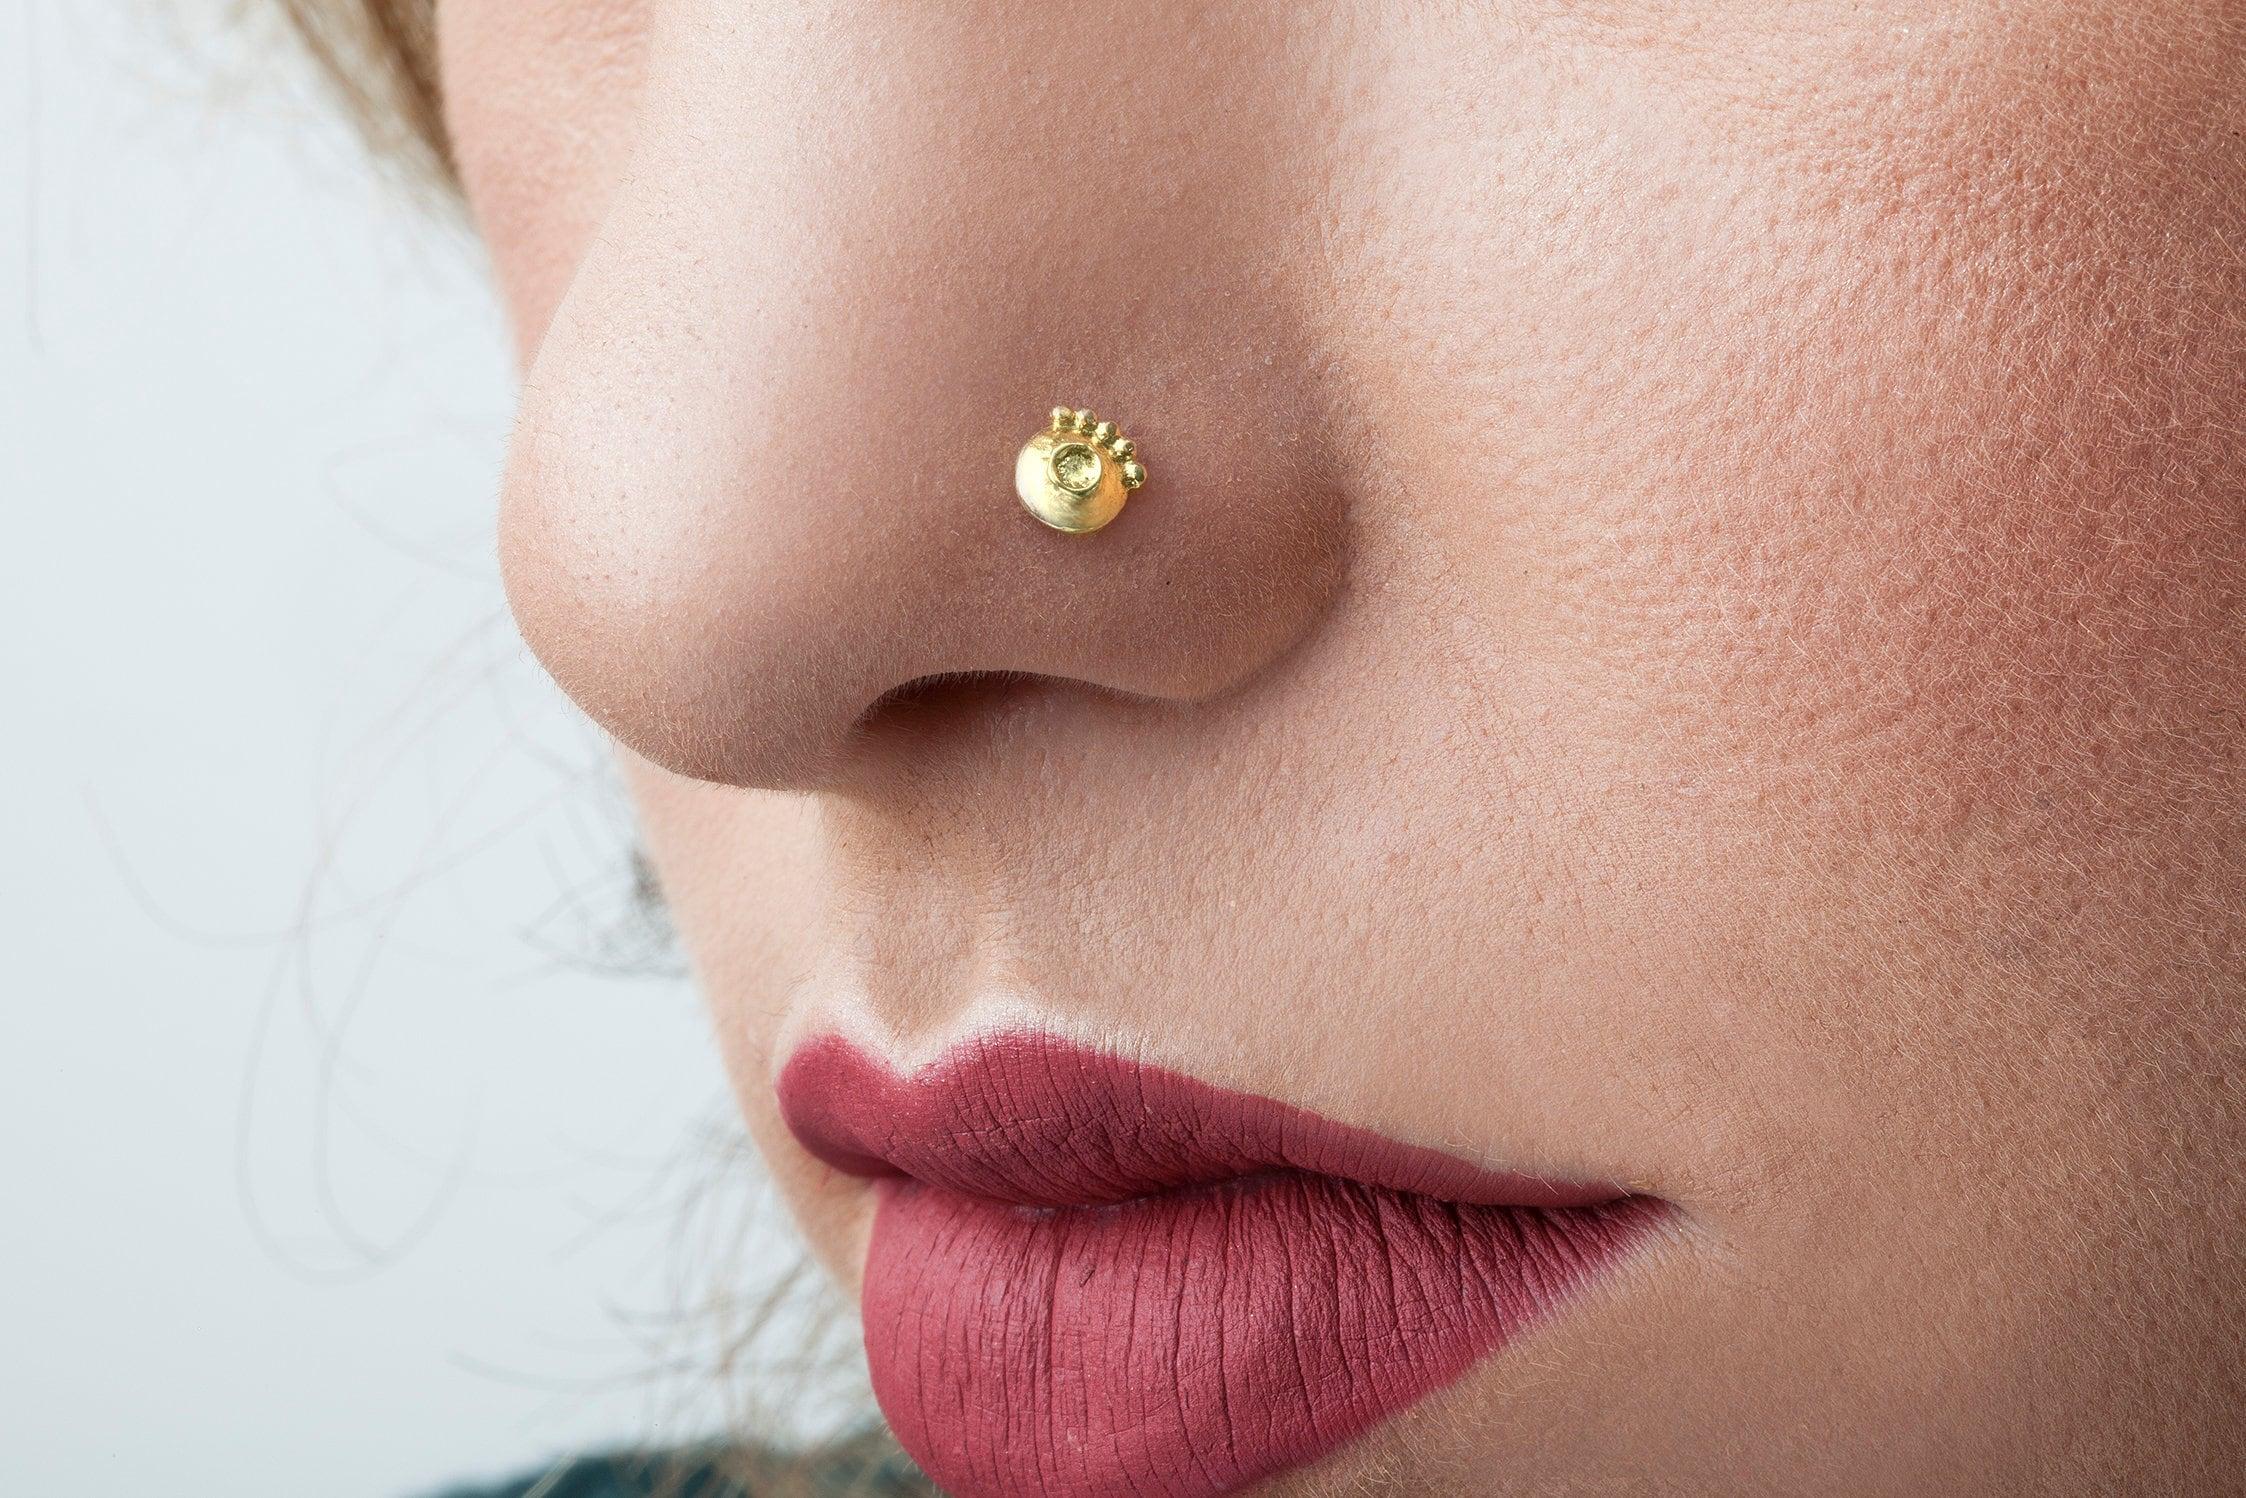 Indian Nose Stud 14 Karat Solid Gold Nose Stud Ring Nose Stud Nose Studs Gold Nose Stud Nose Bling Nose Pin